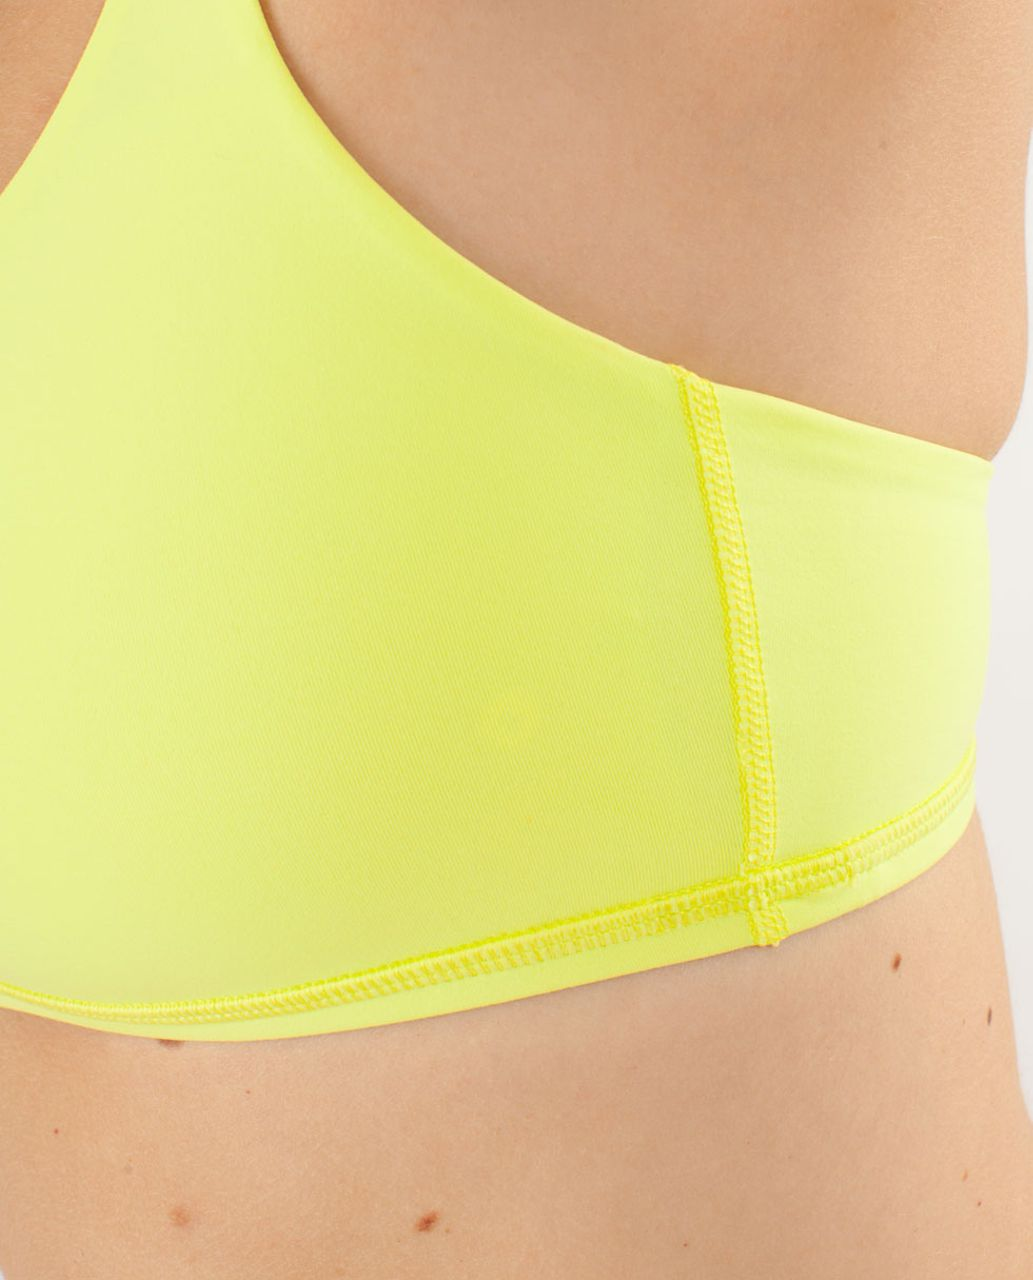 Lululemon Free To Be Bra - Clarity Yellow